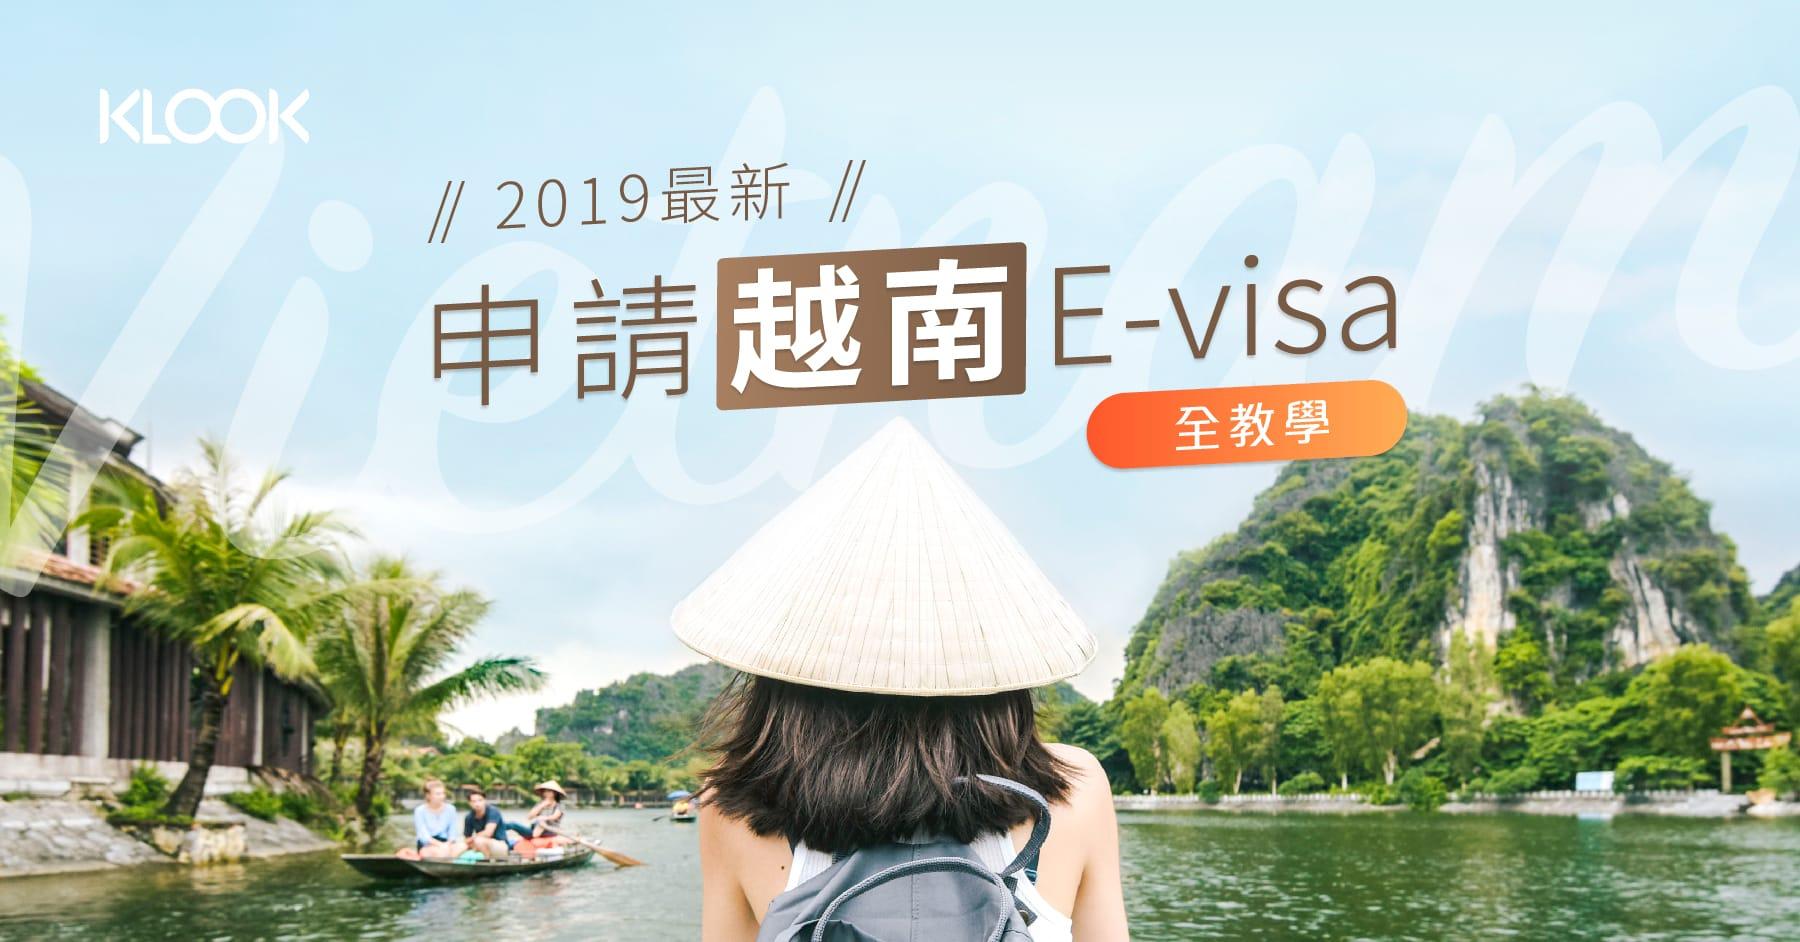 190508 Blog banner Vietnam